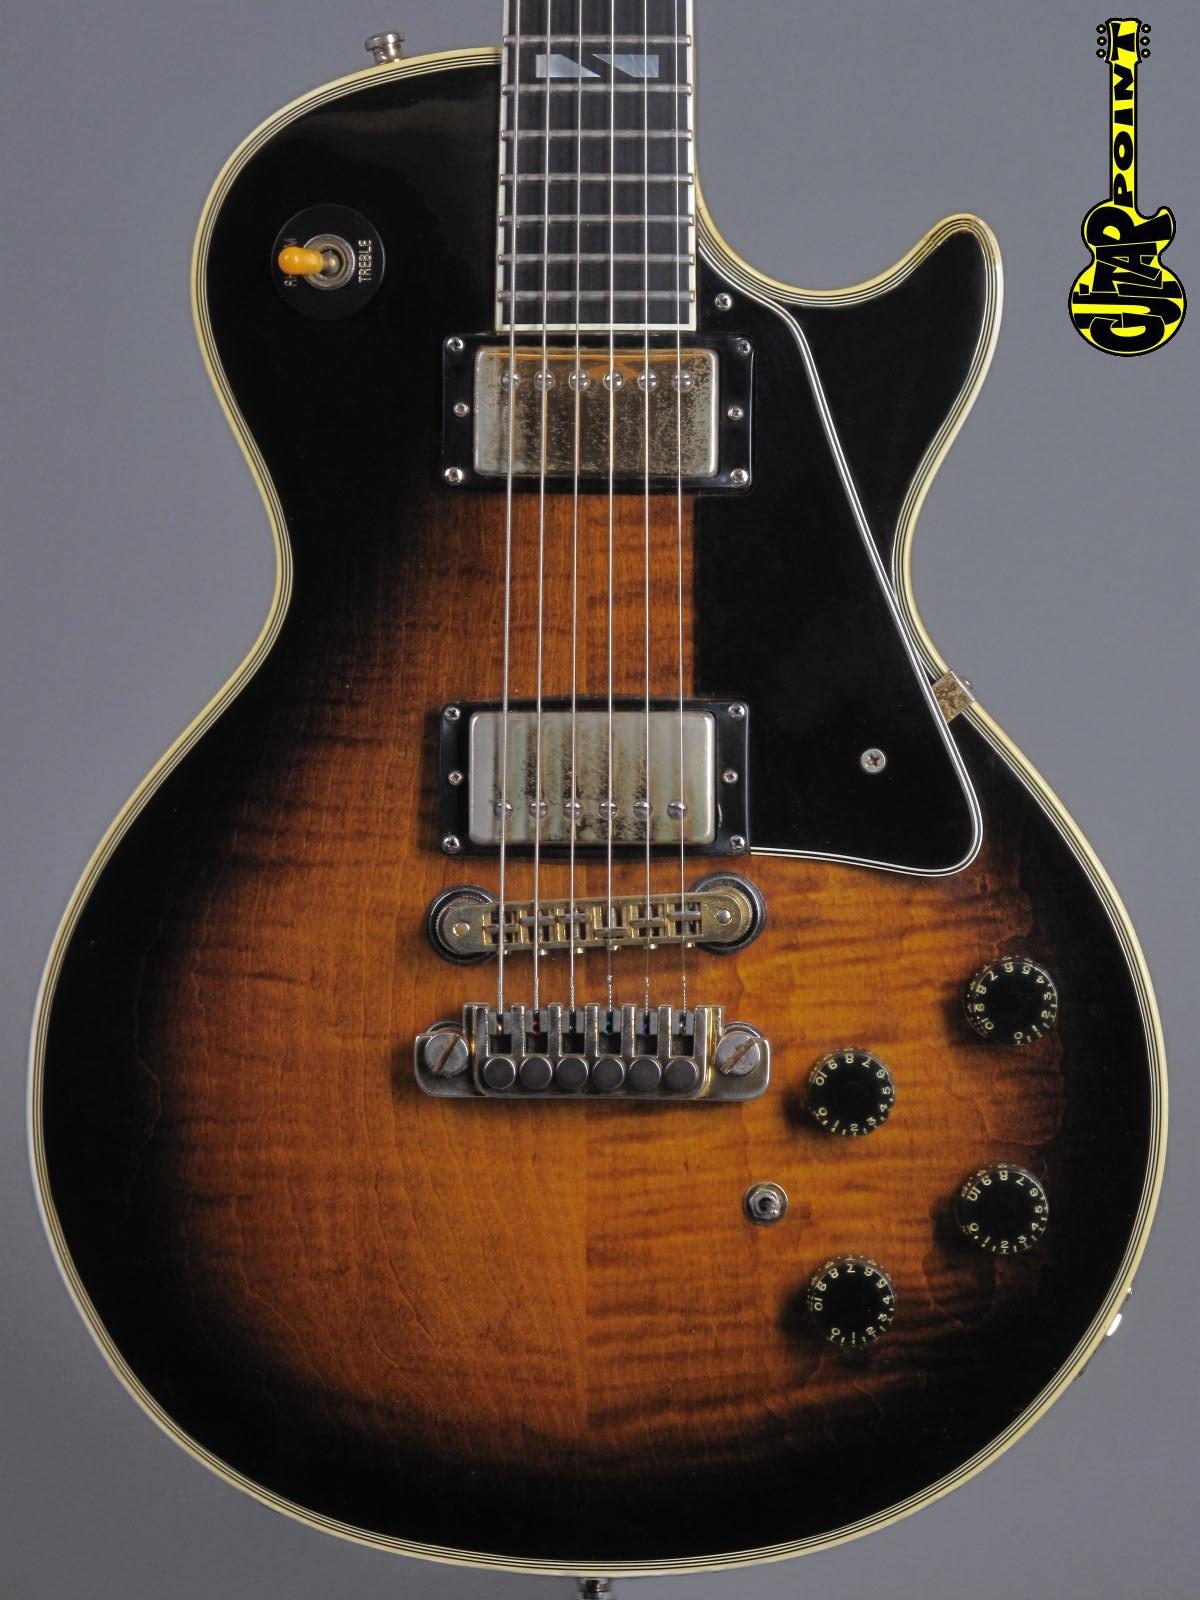 1979 Gibson Les Paul 25/50 Anniversary - Sunburst